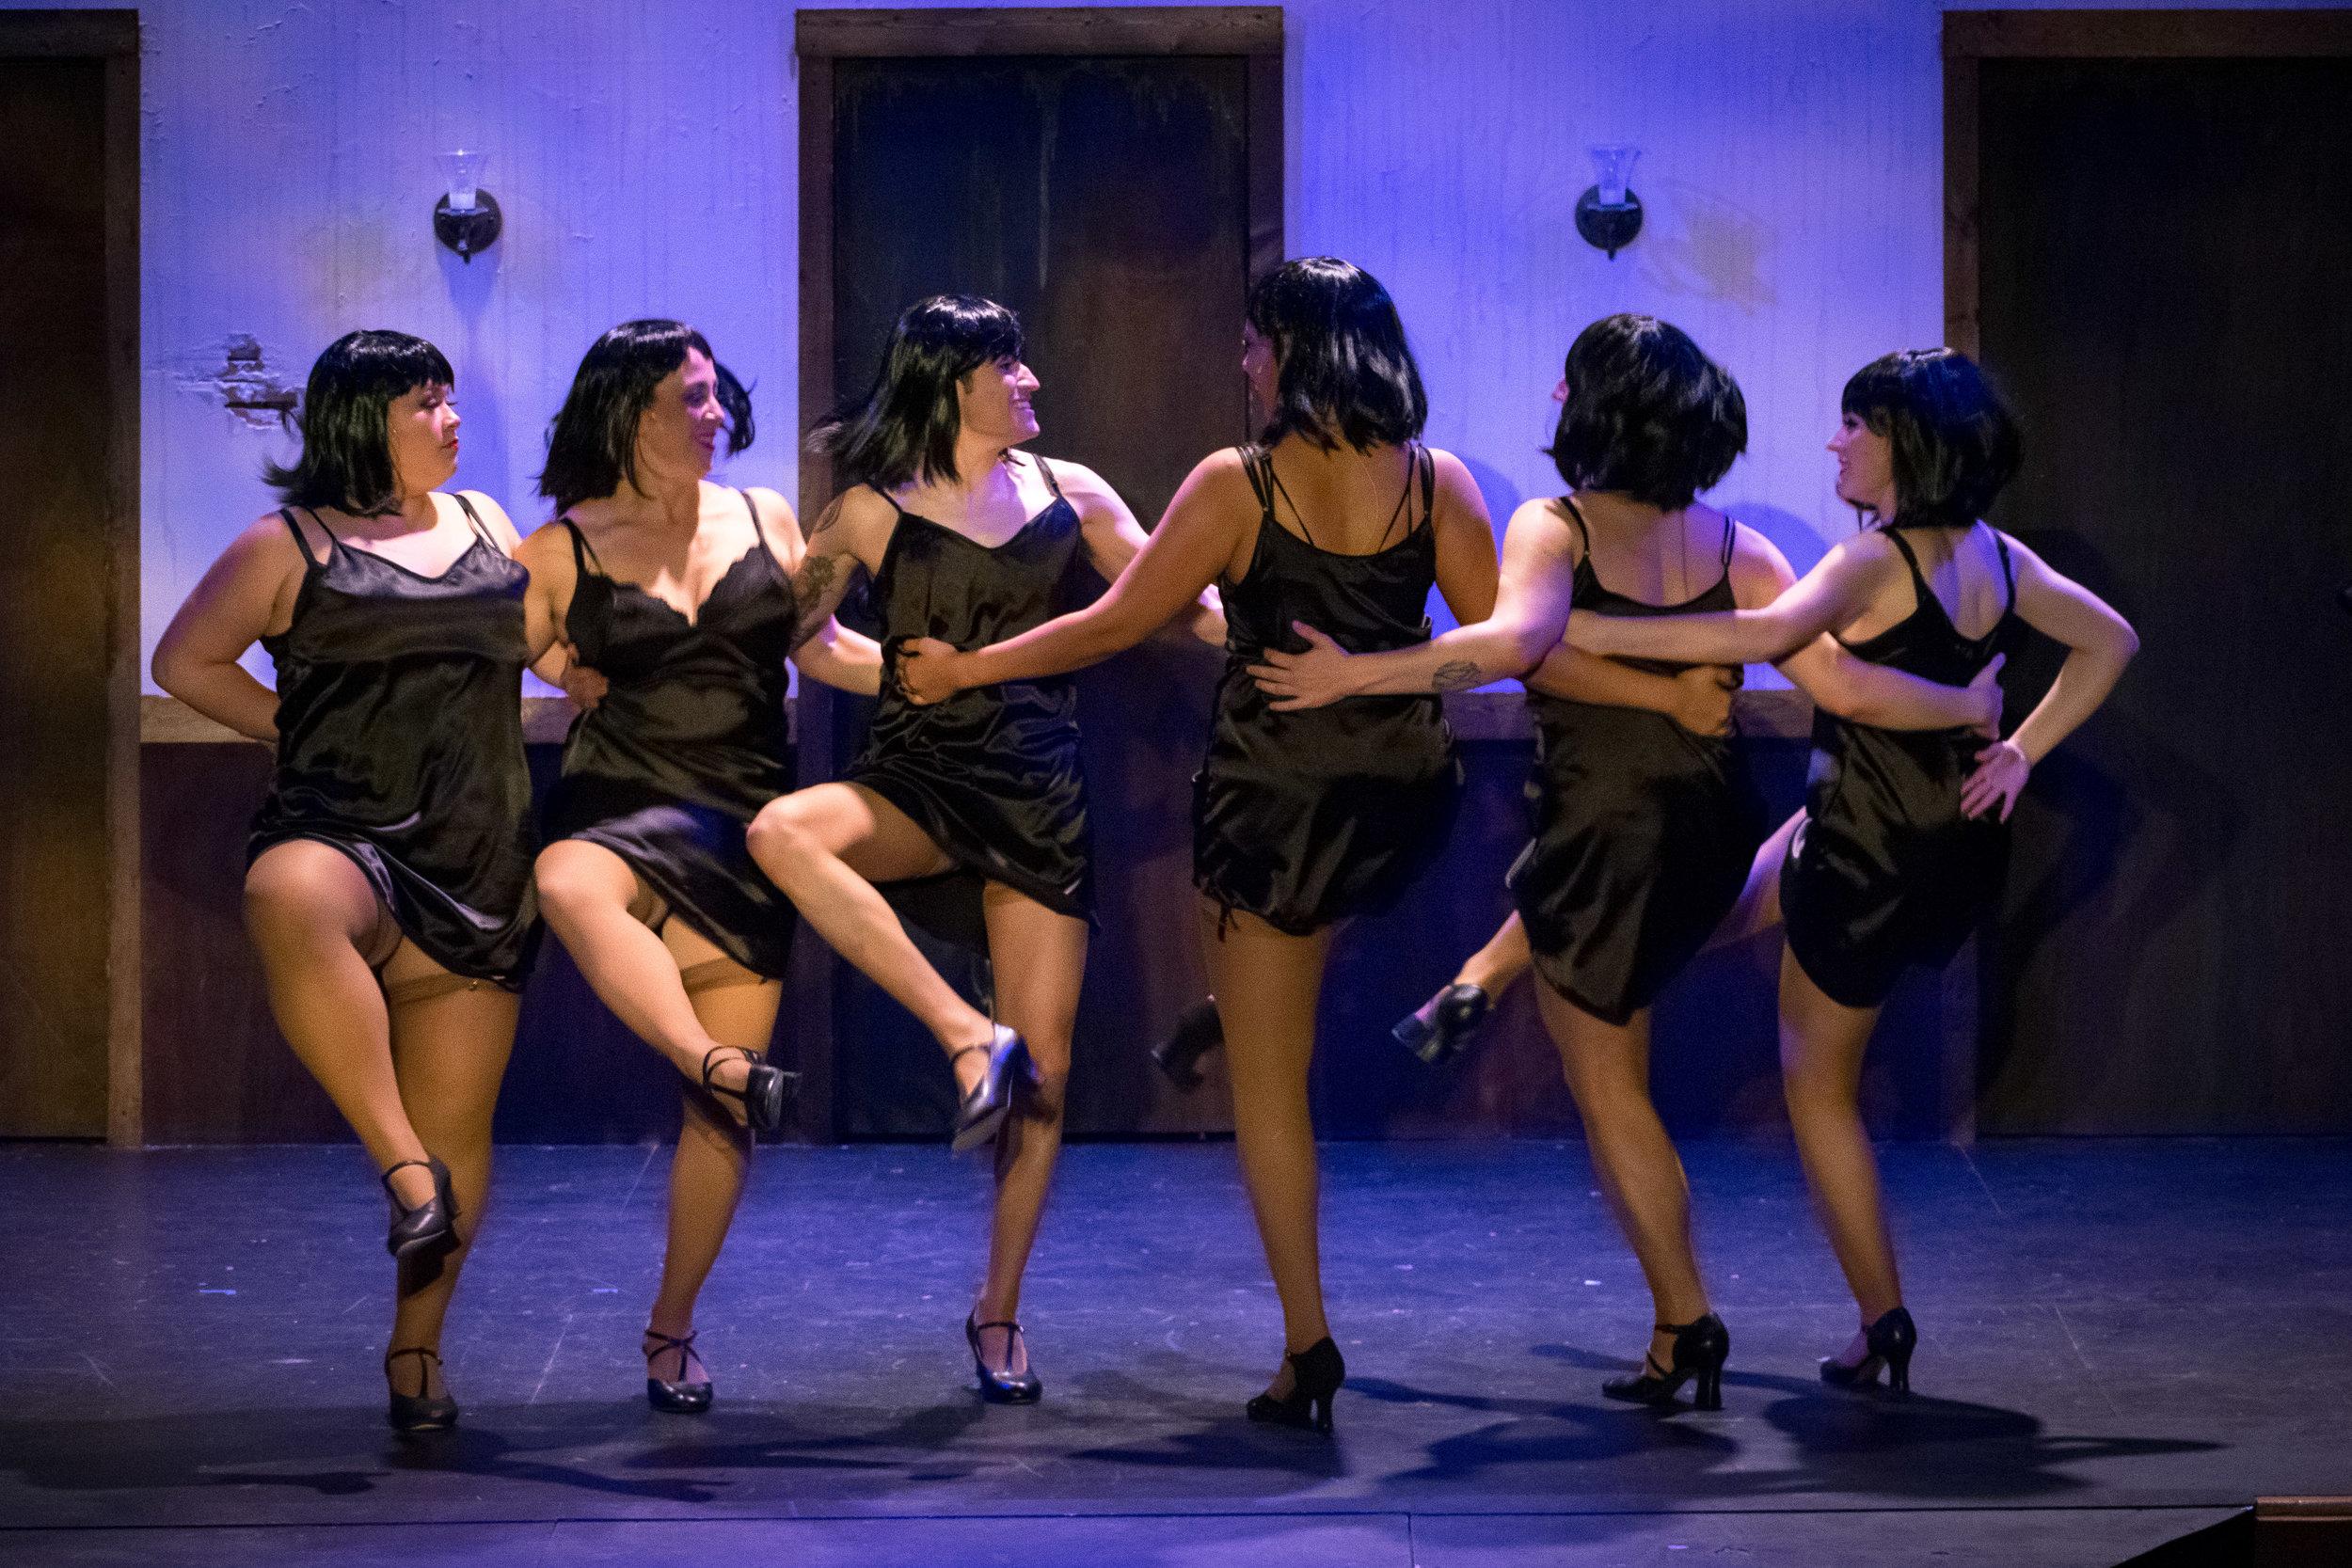 Some of the Kit Kat Dancers in Cabaret